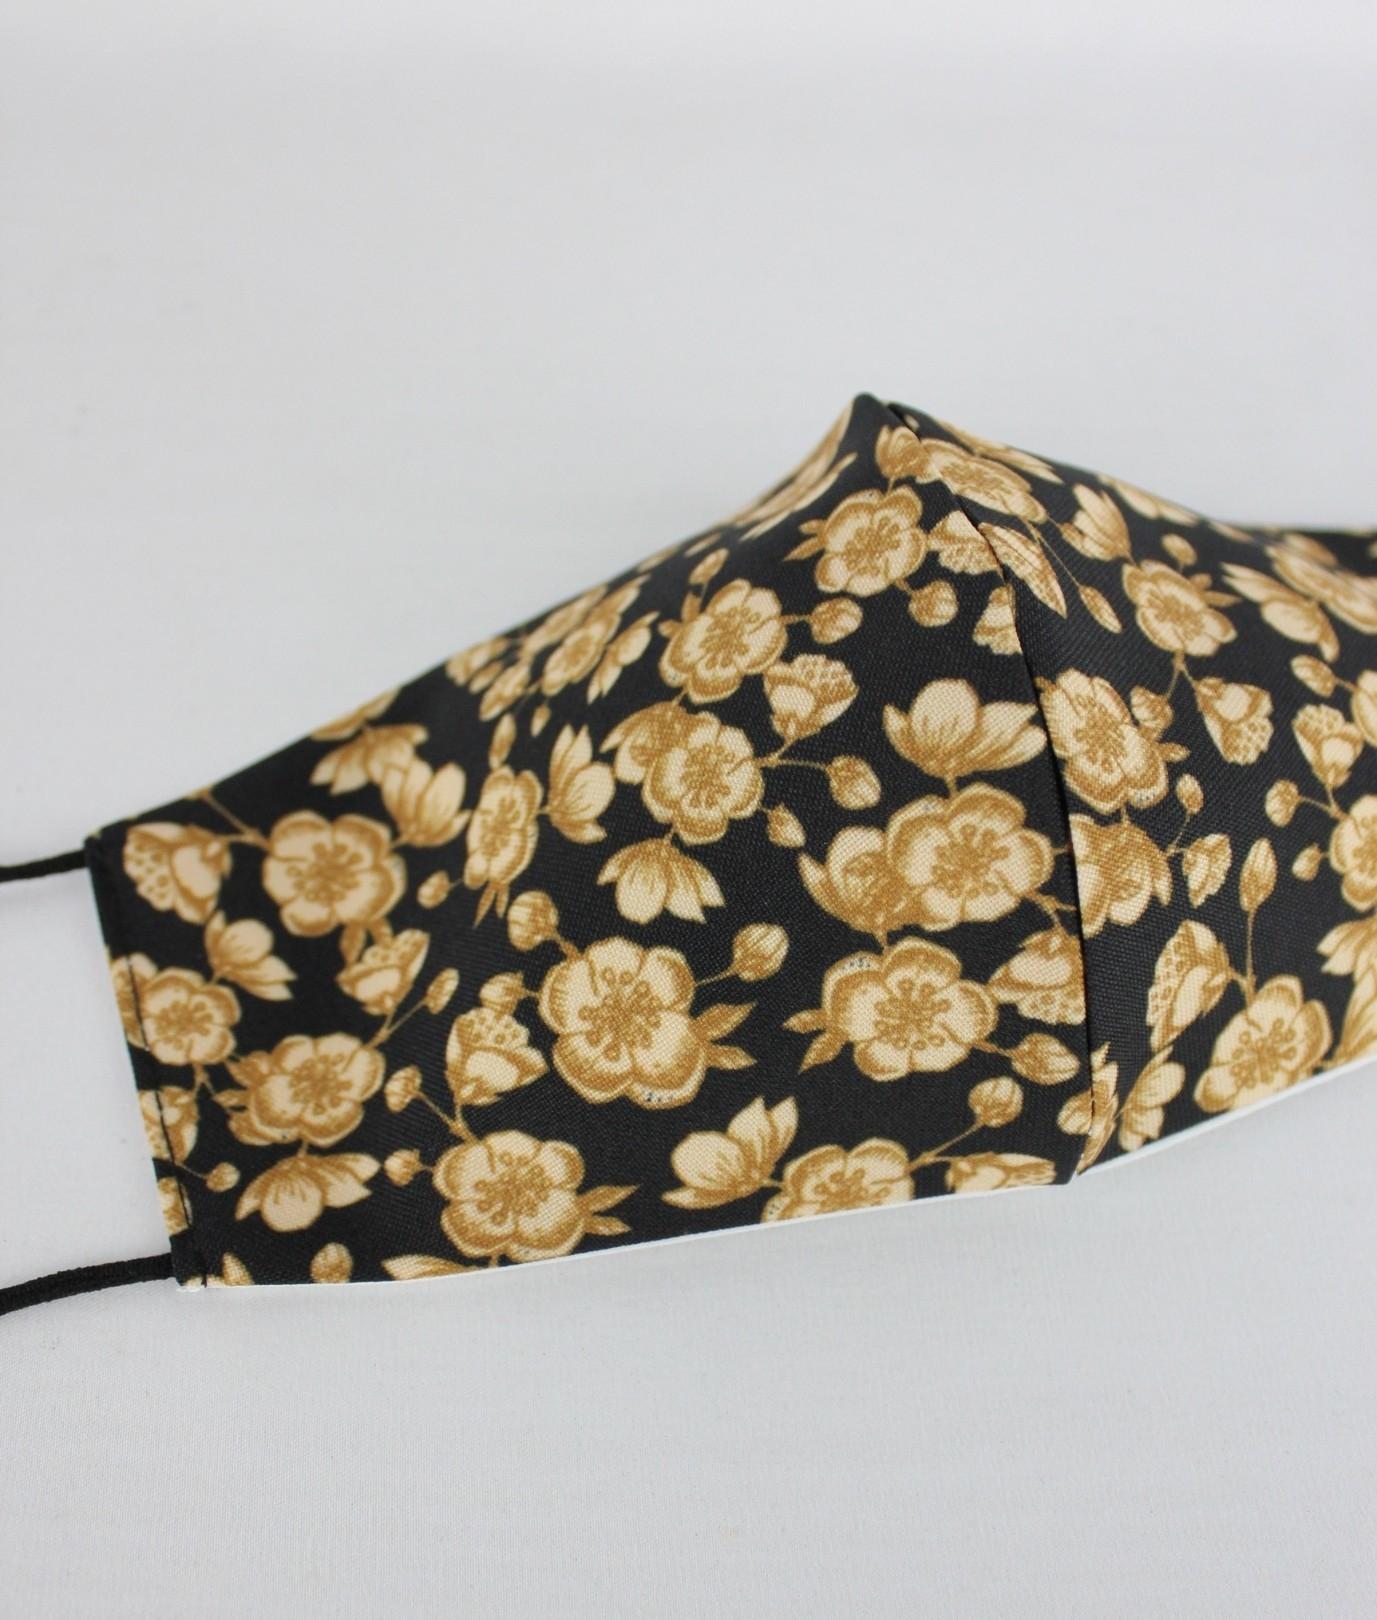 Masque Yesitex - Fleurs CN